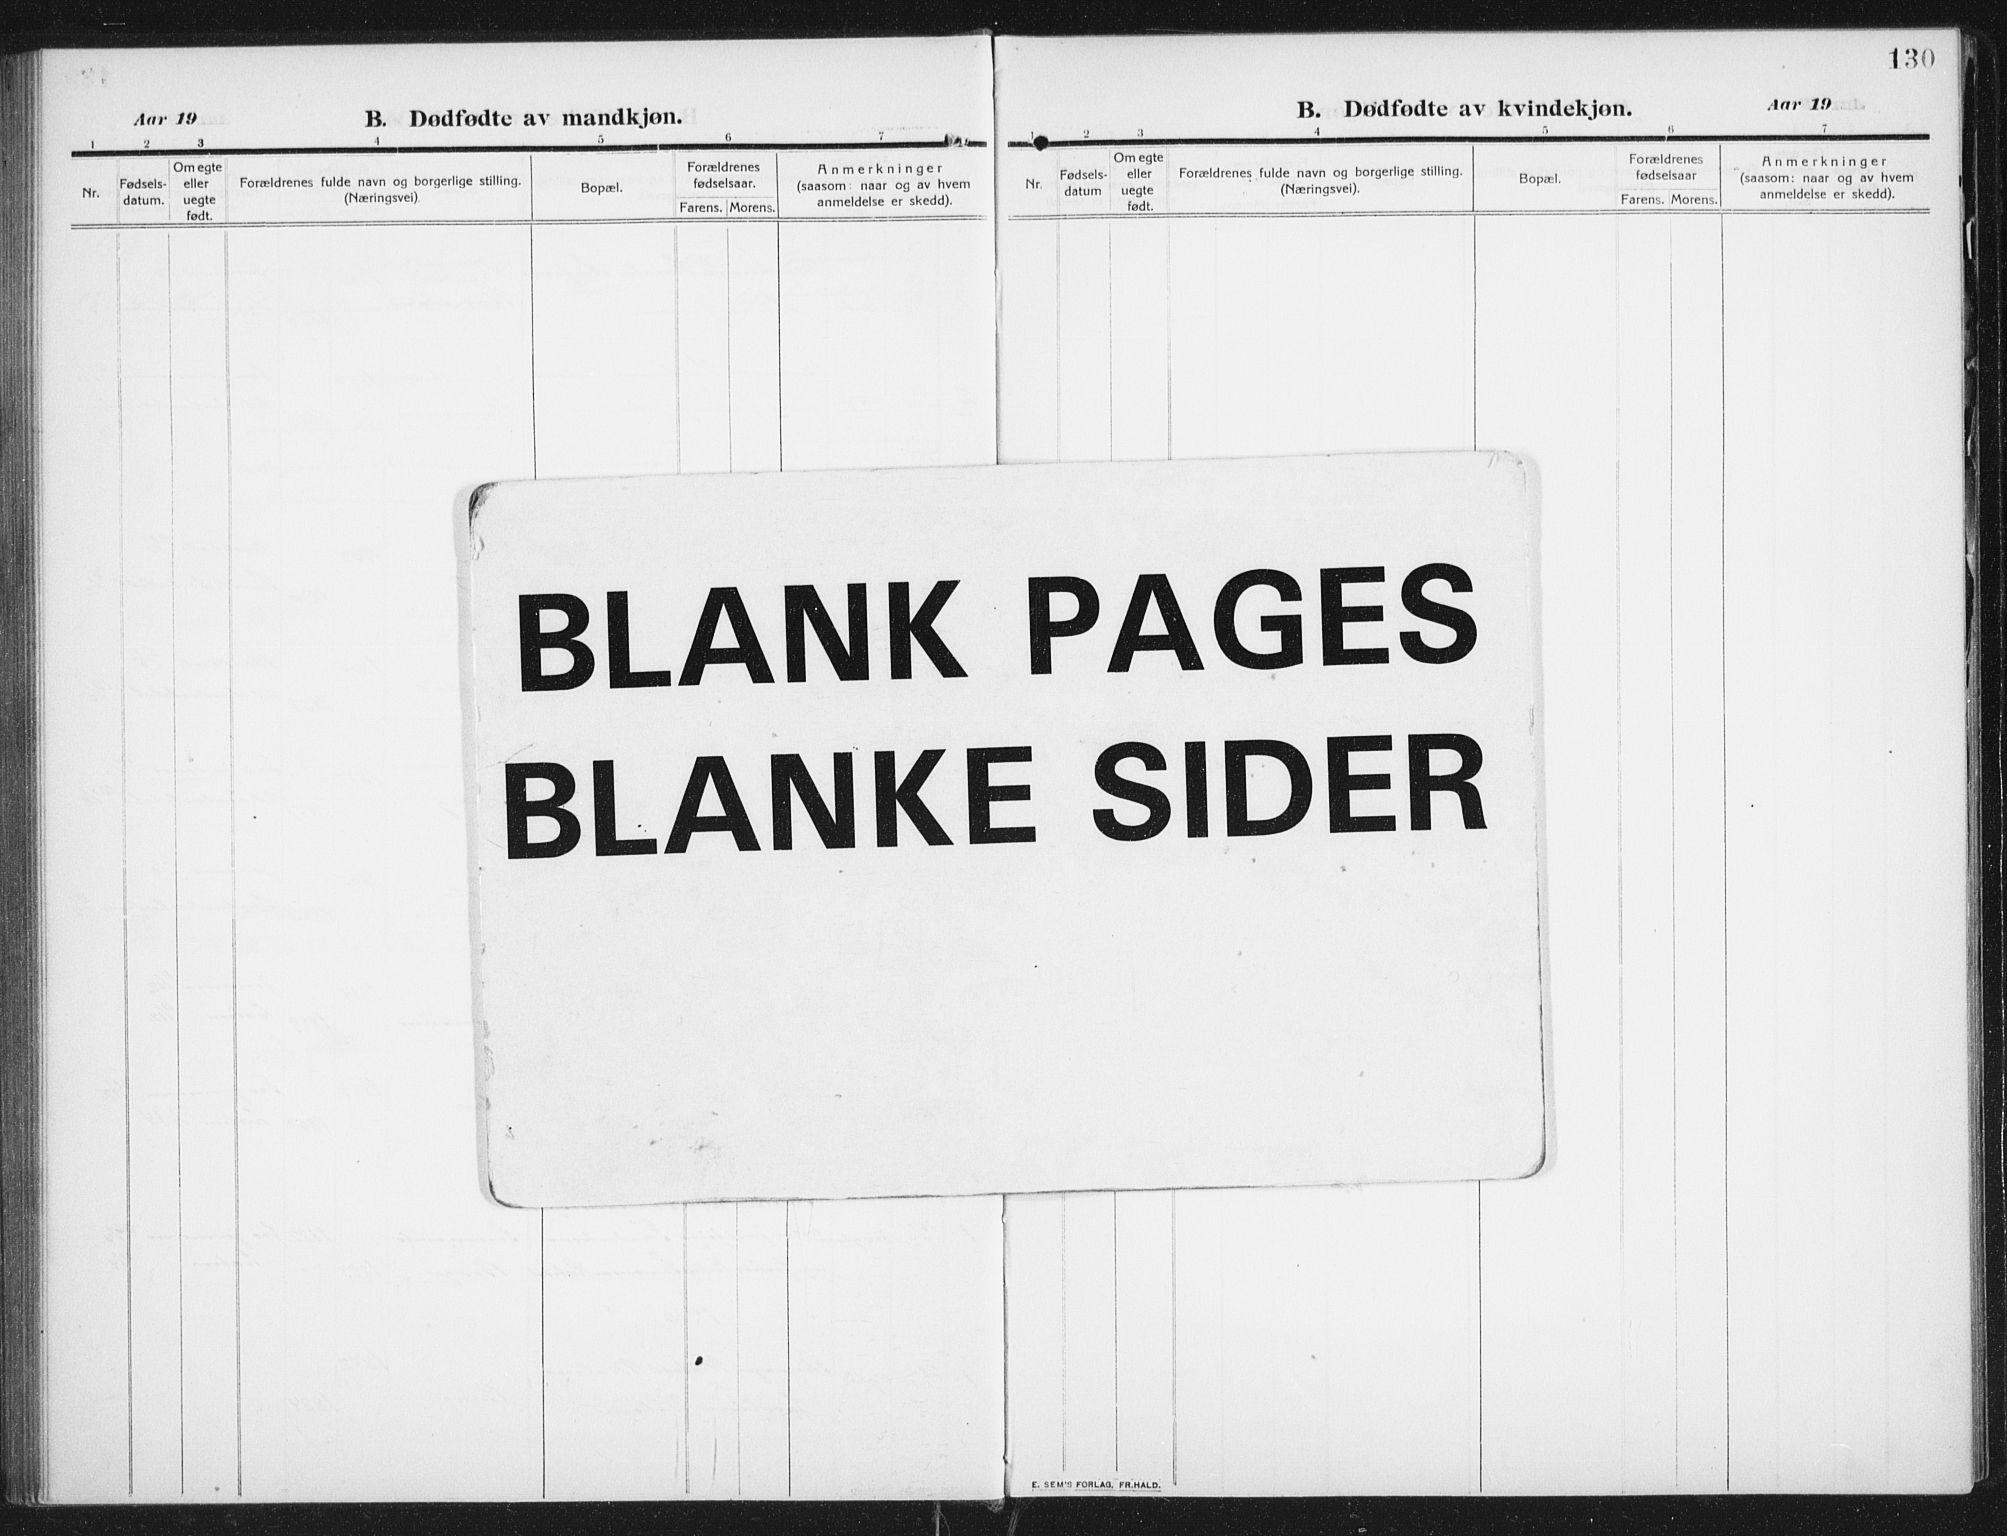 SAT, Ministerialprotokoller, klokkerbøker og fødselsregistre - Nordland, 882/L1183: Klokkerbok nr. 882C01, 1911-1938, s. 130